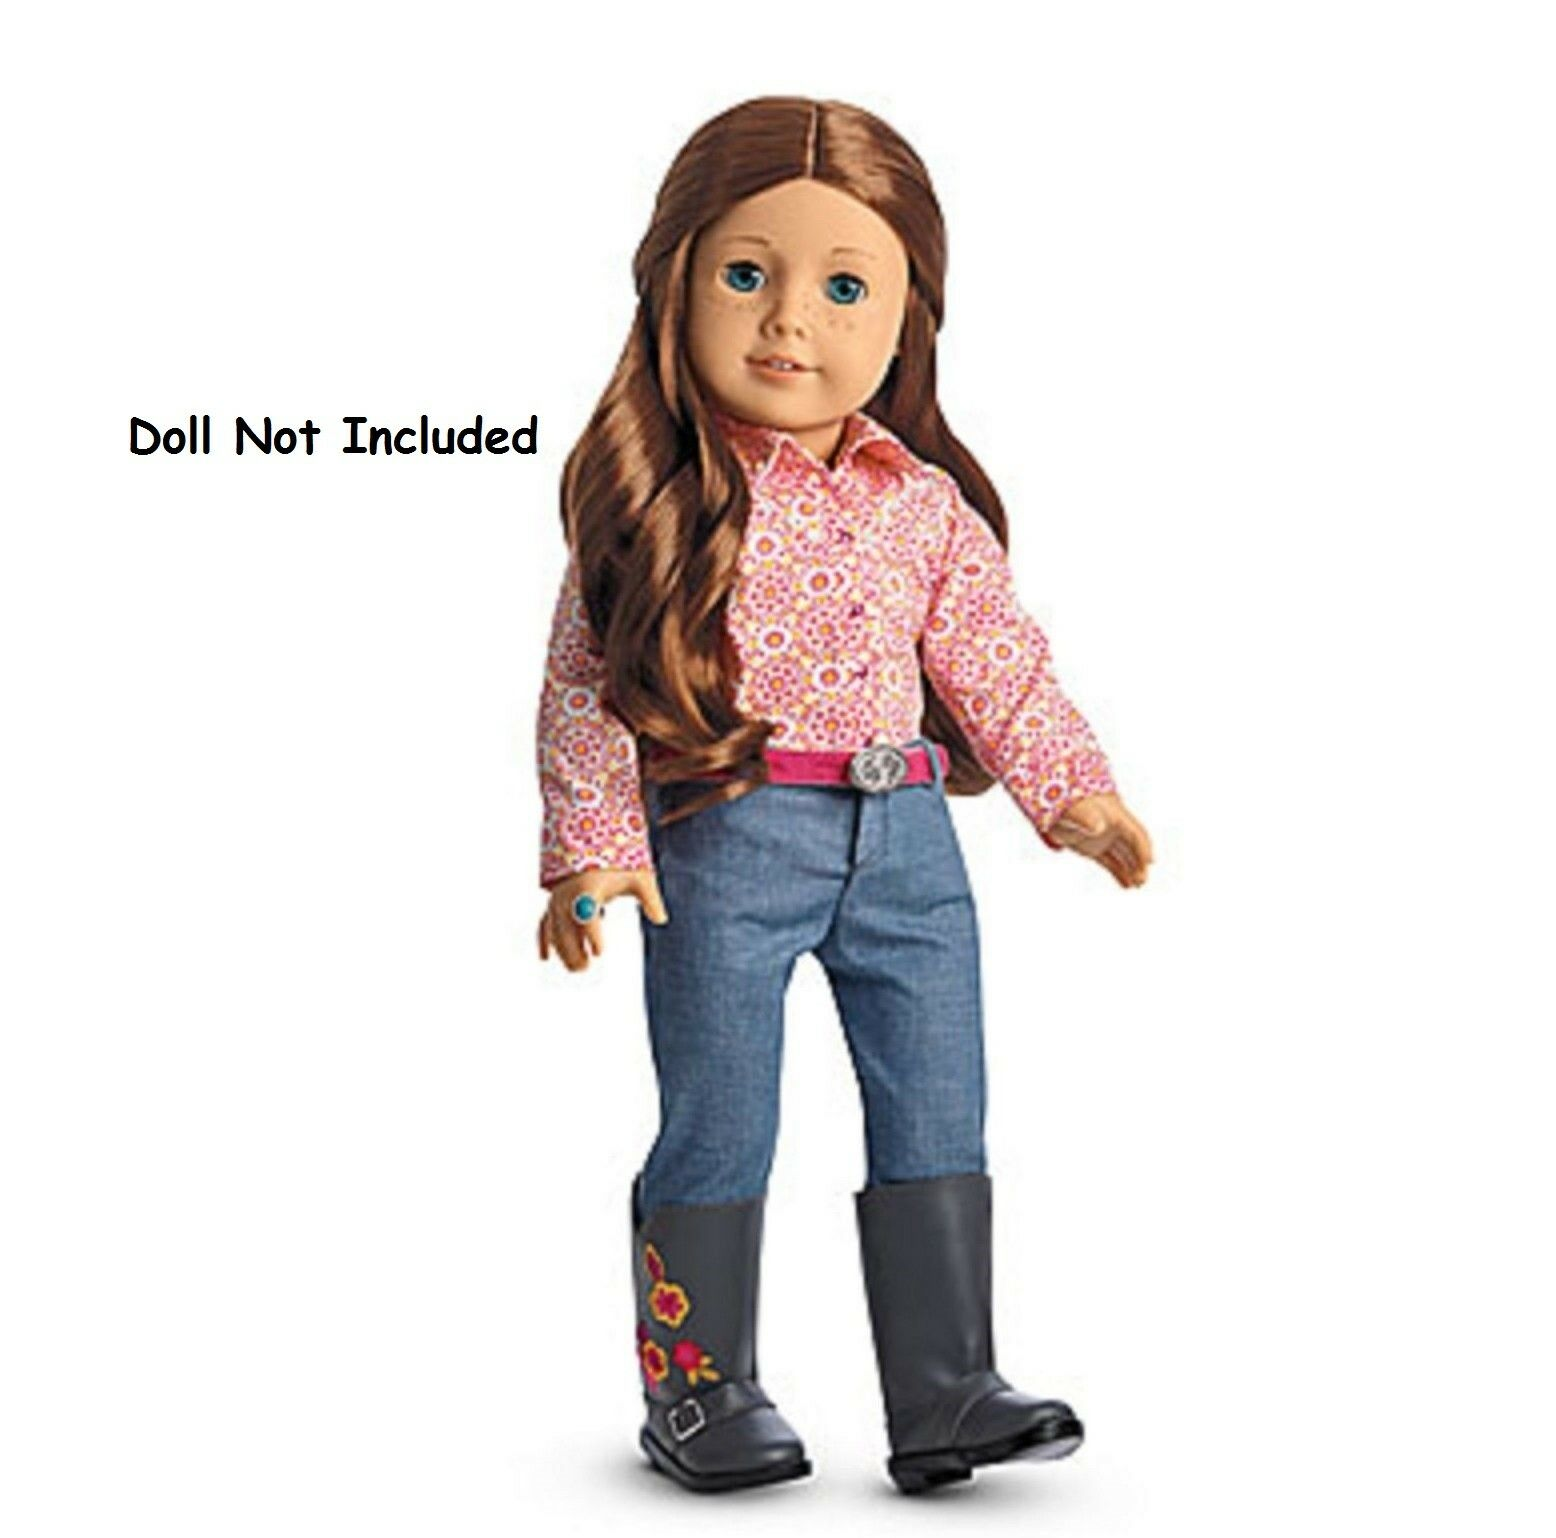 American Girl Saige Parade Completo Pennino Western Cintura Stivali Jeans No